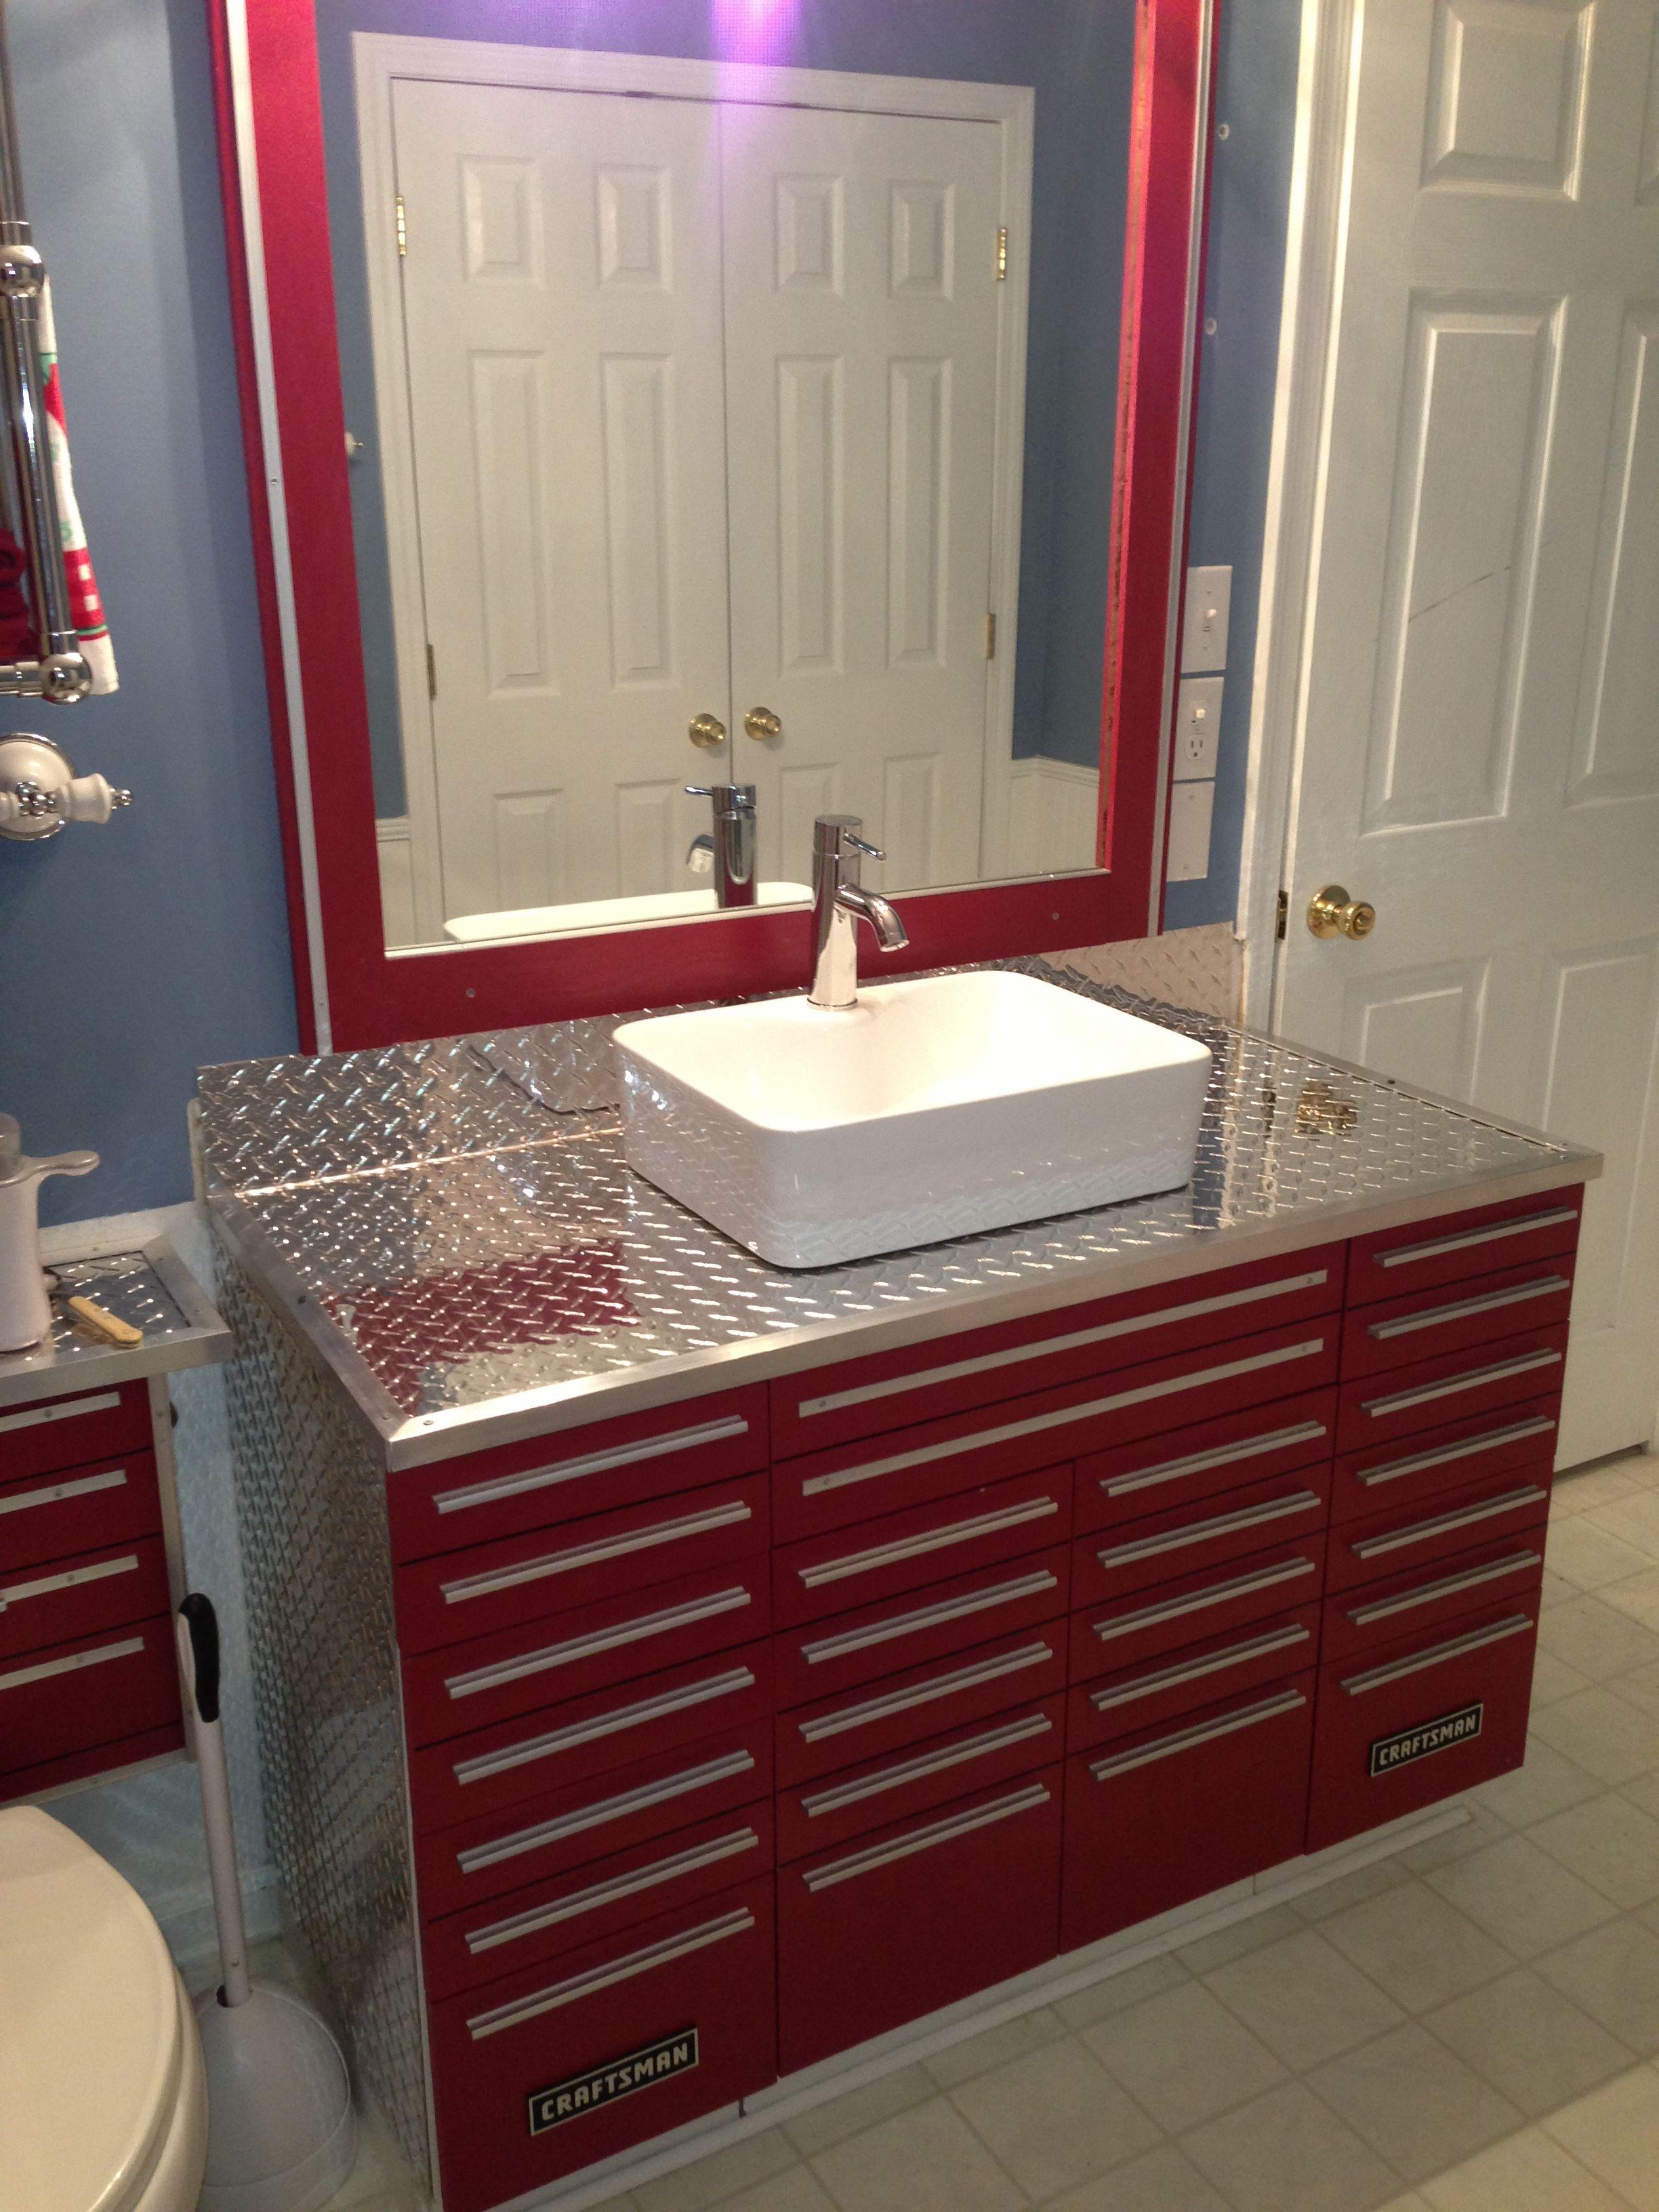 Craftsman Tool Box Vanity With Vessel Sink Unique